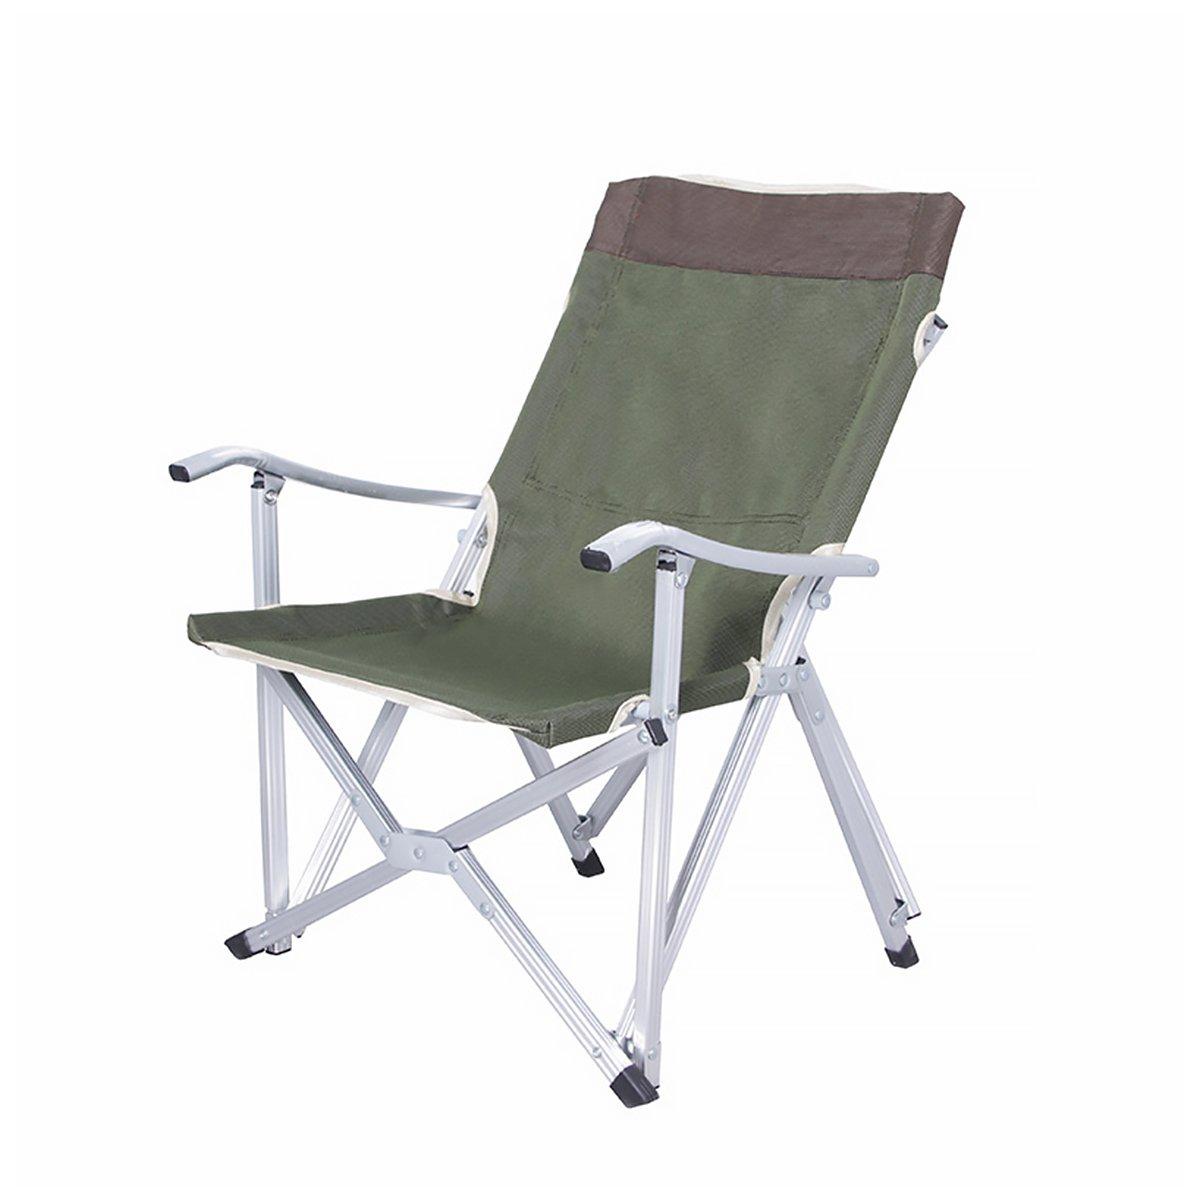 Niceway Camping Full Back Folding Director's Chair